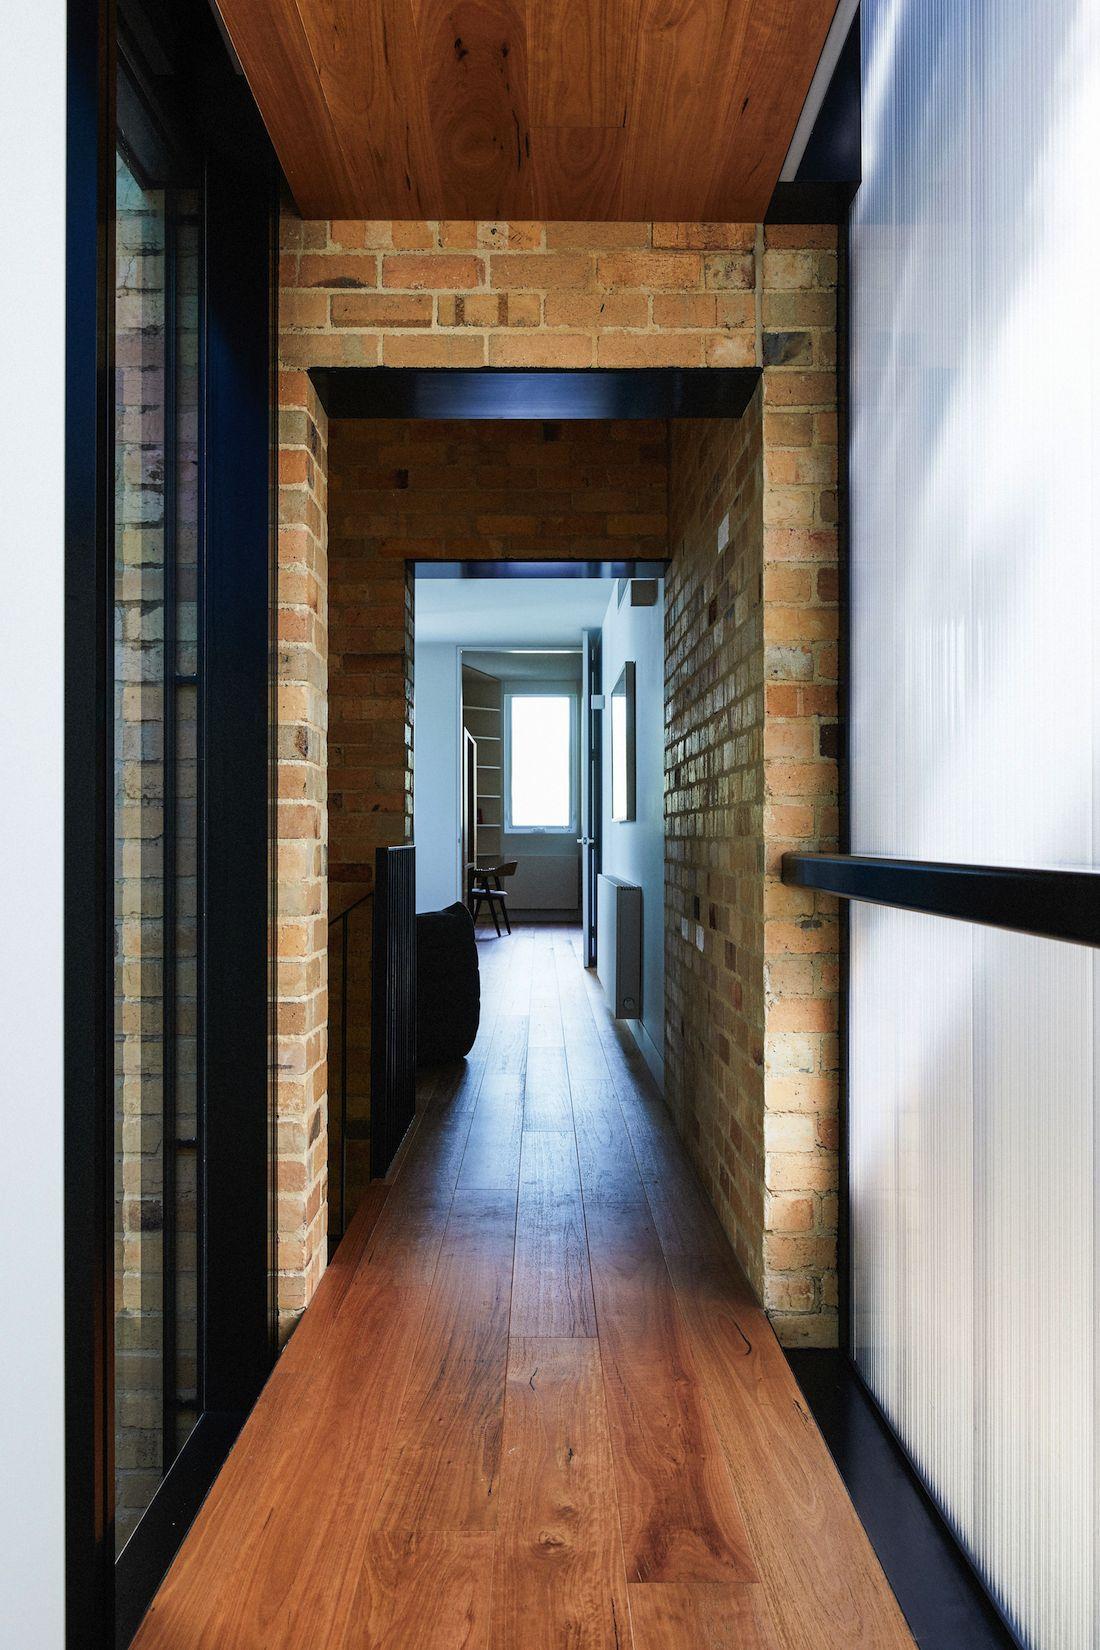 Mixed textures of materials in hallway